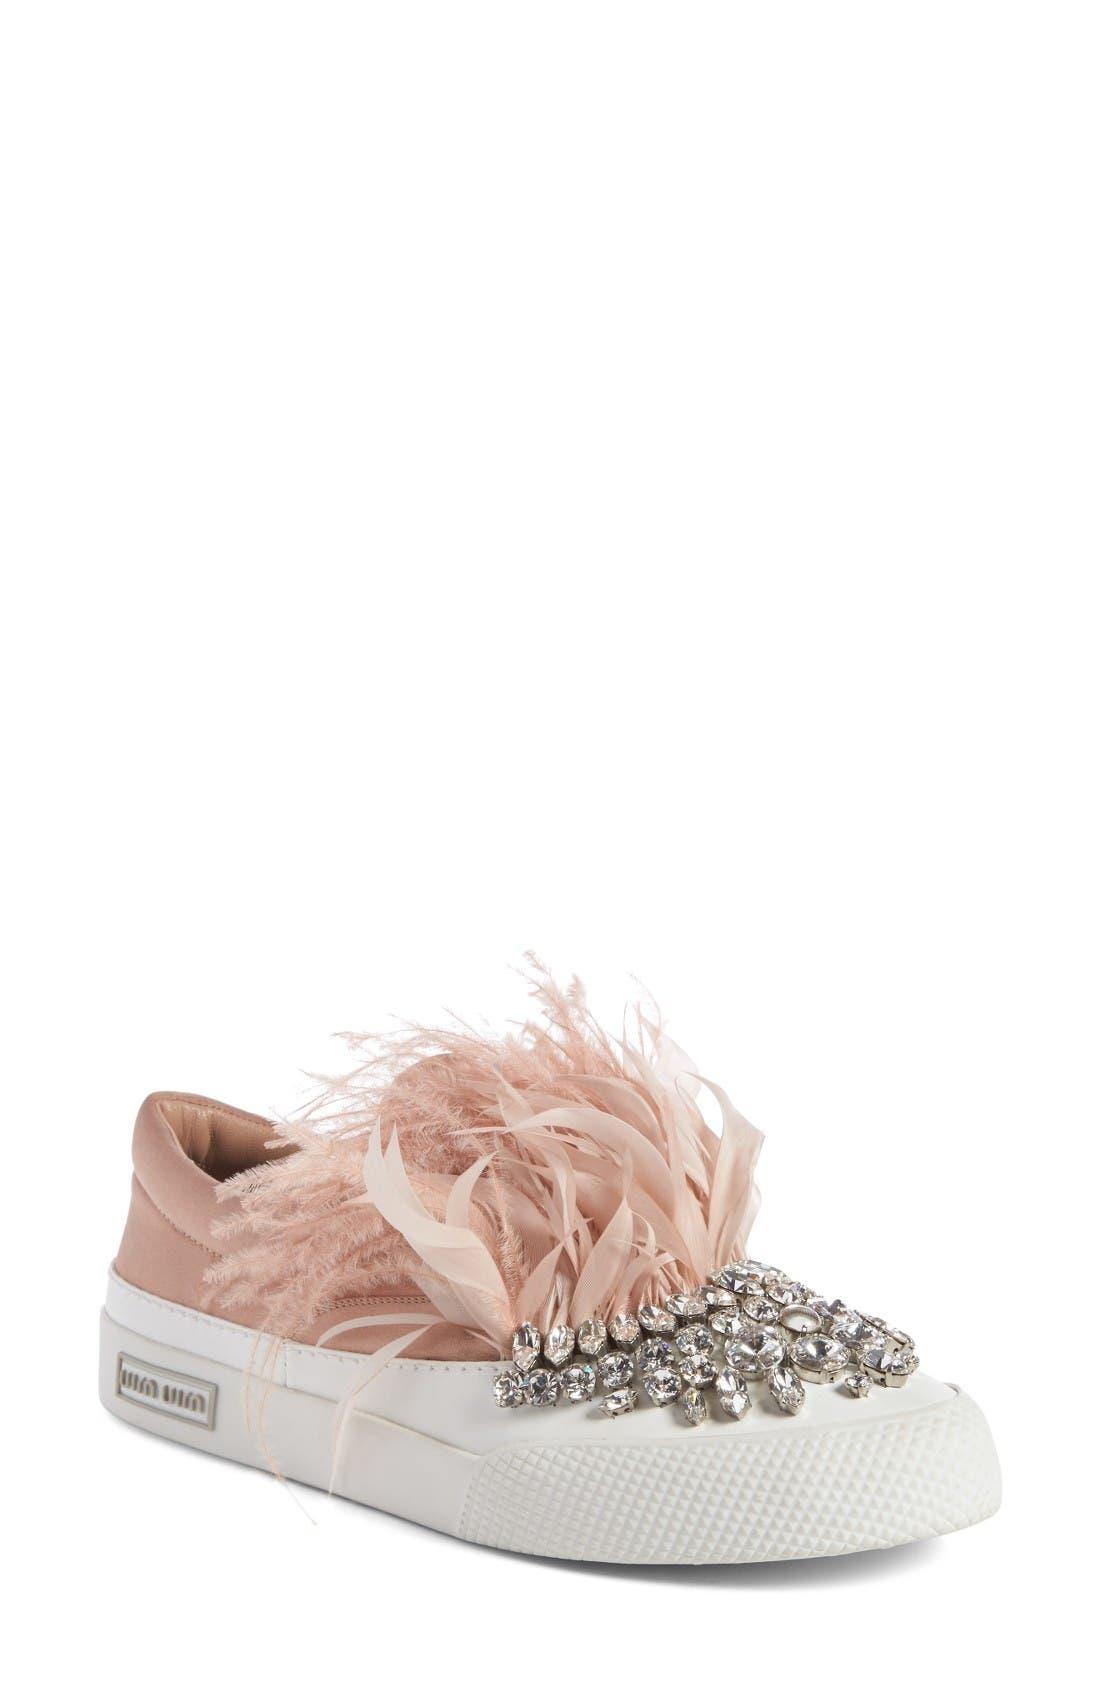 Miu Miu Embellished Feather Slip-On Sneaker (Women)